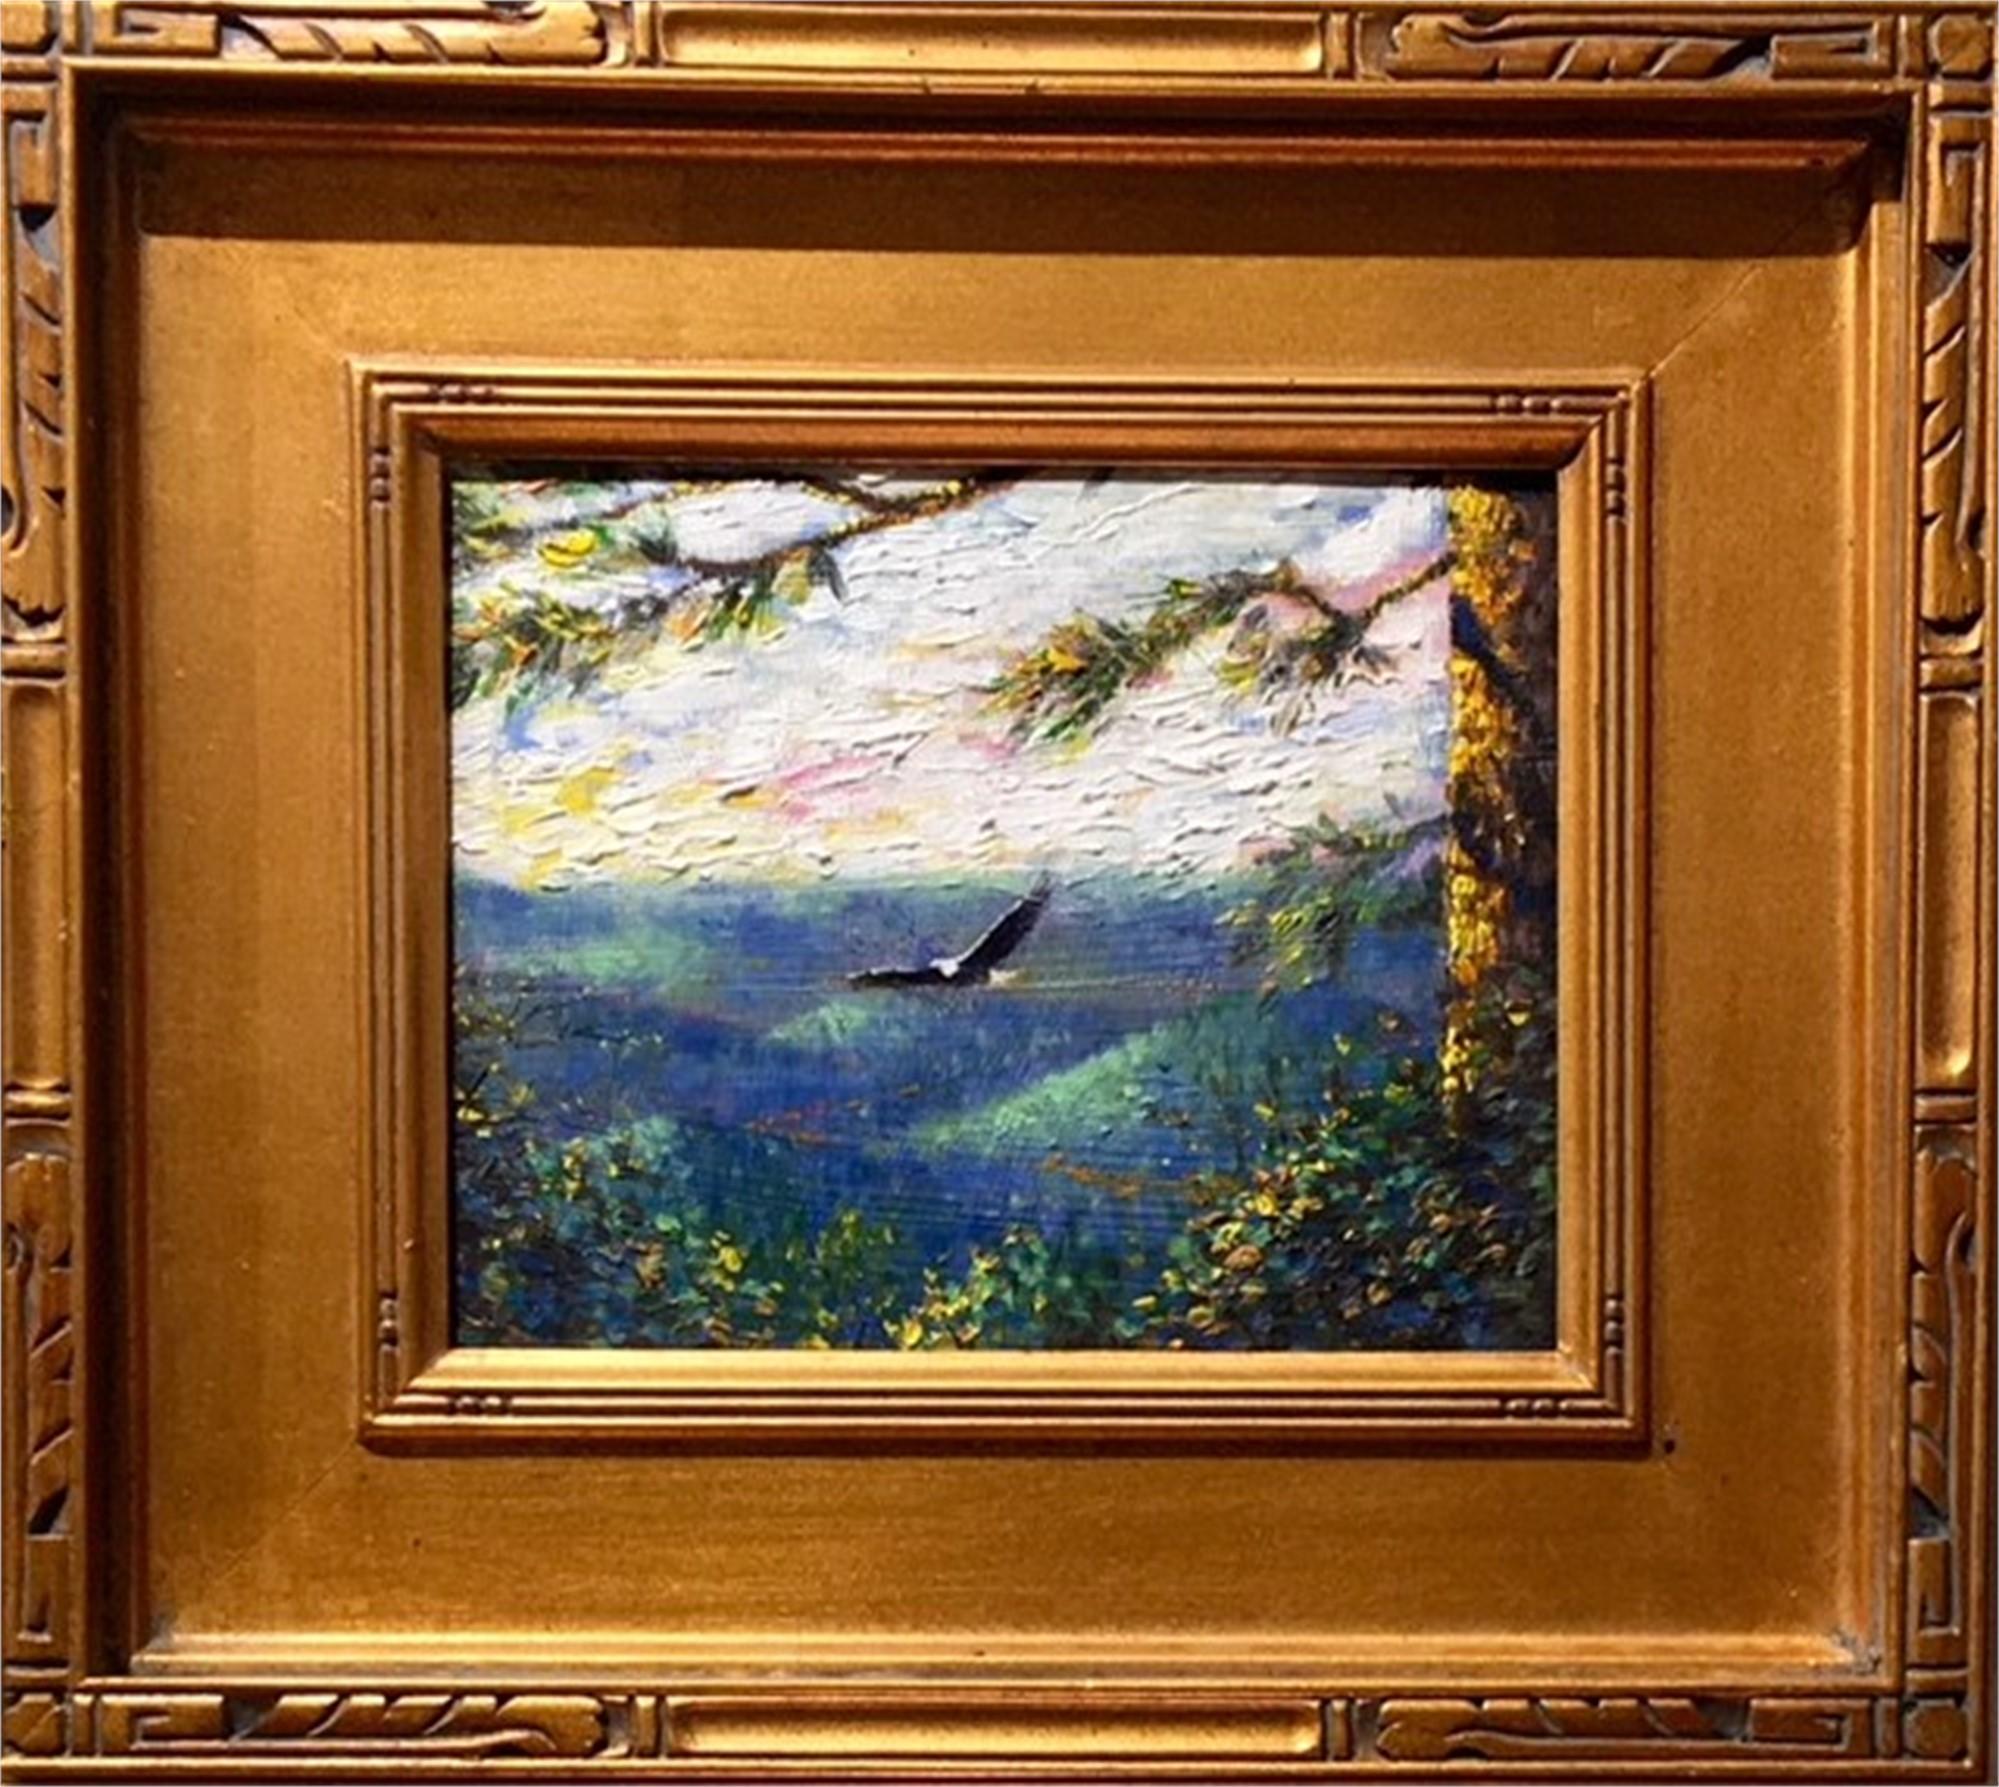 Free Flight by James J. Williams